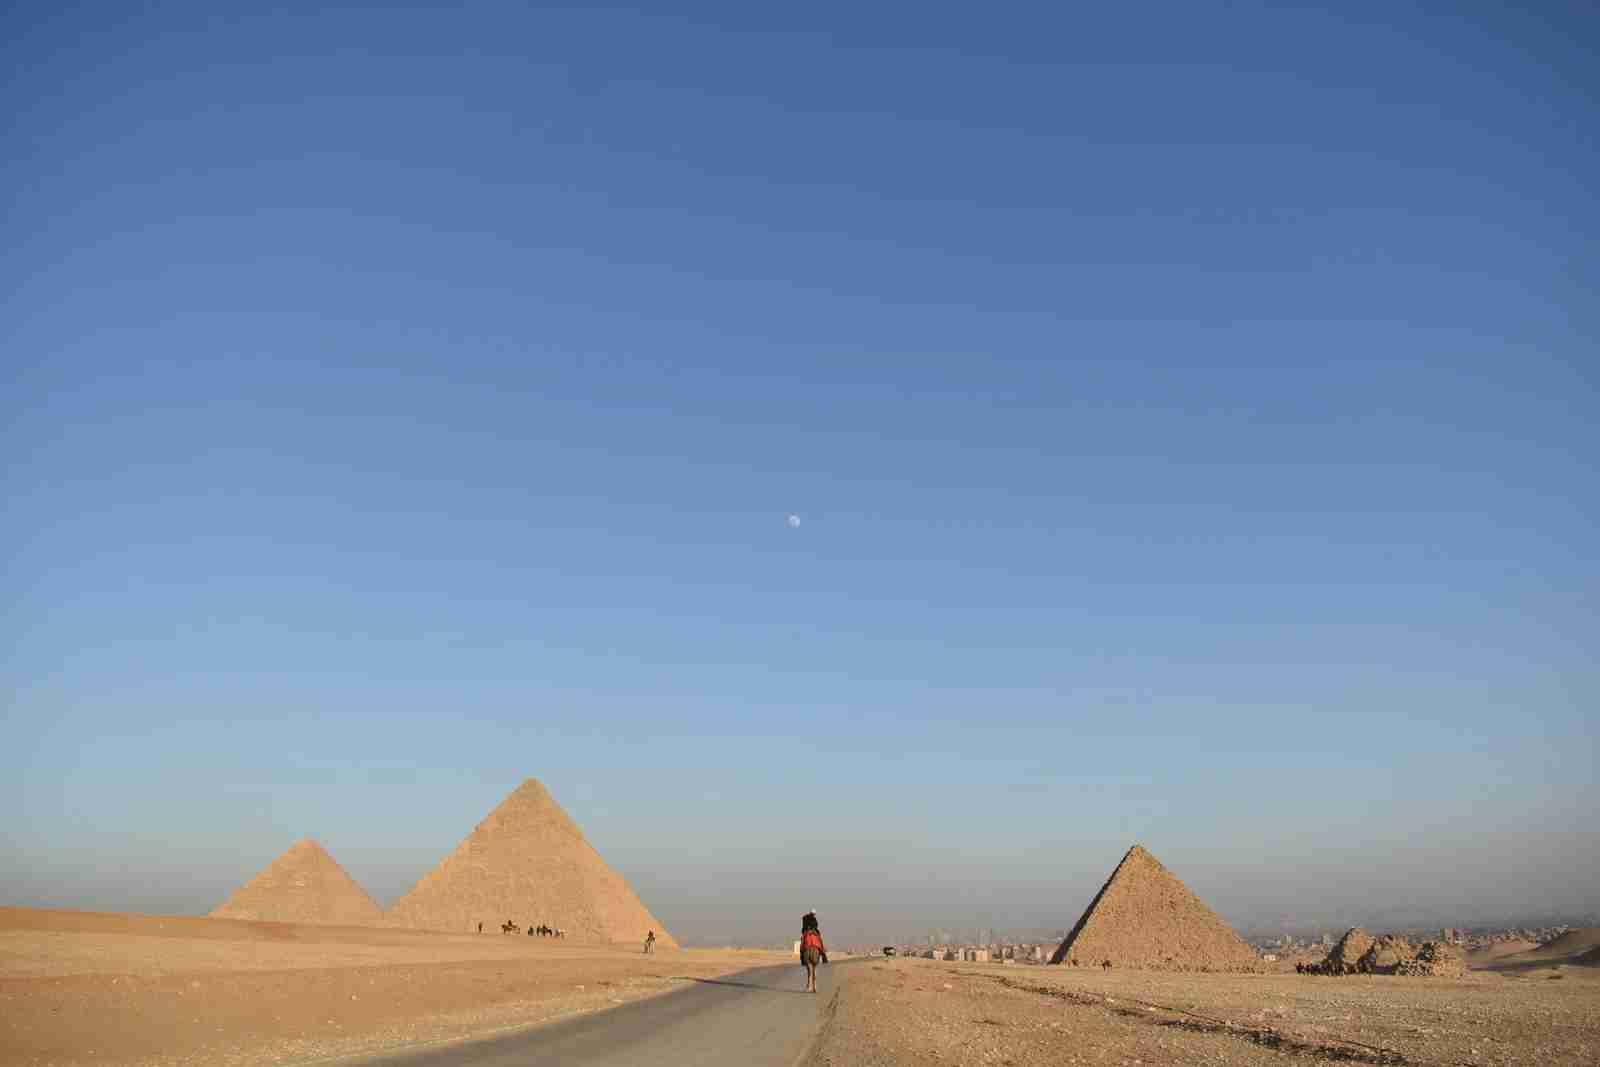 Giza, Egypt. (Photo by Carlos Aguilar/Unsplash)